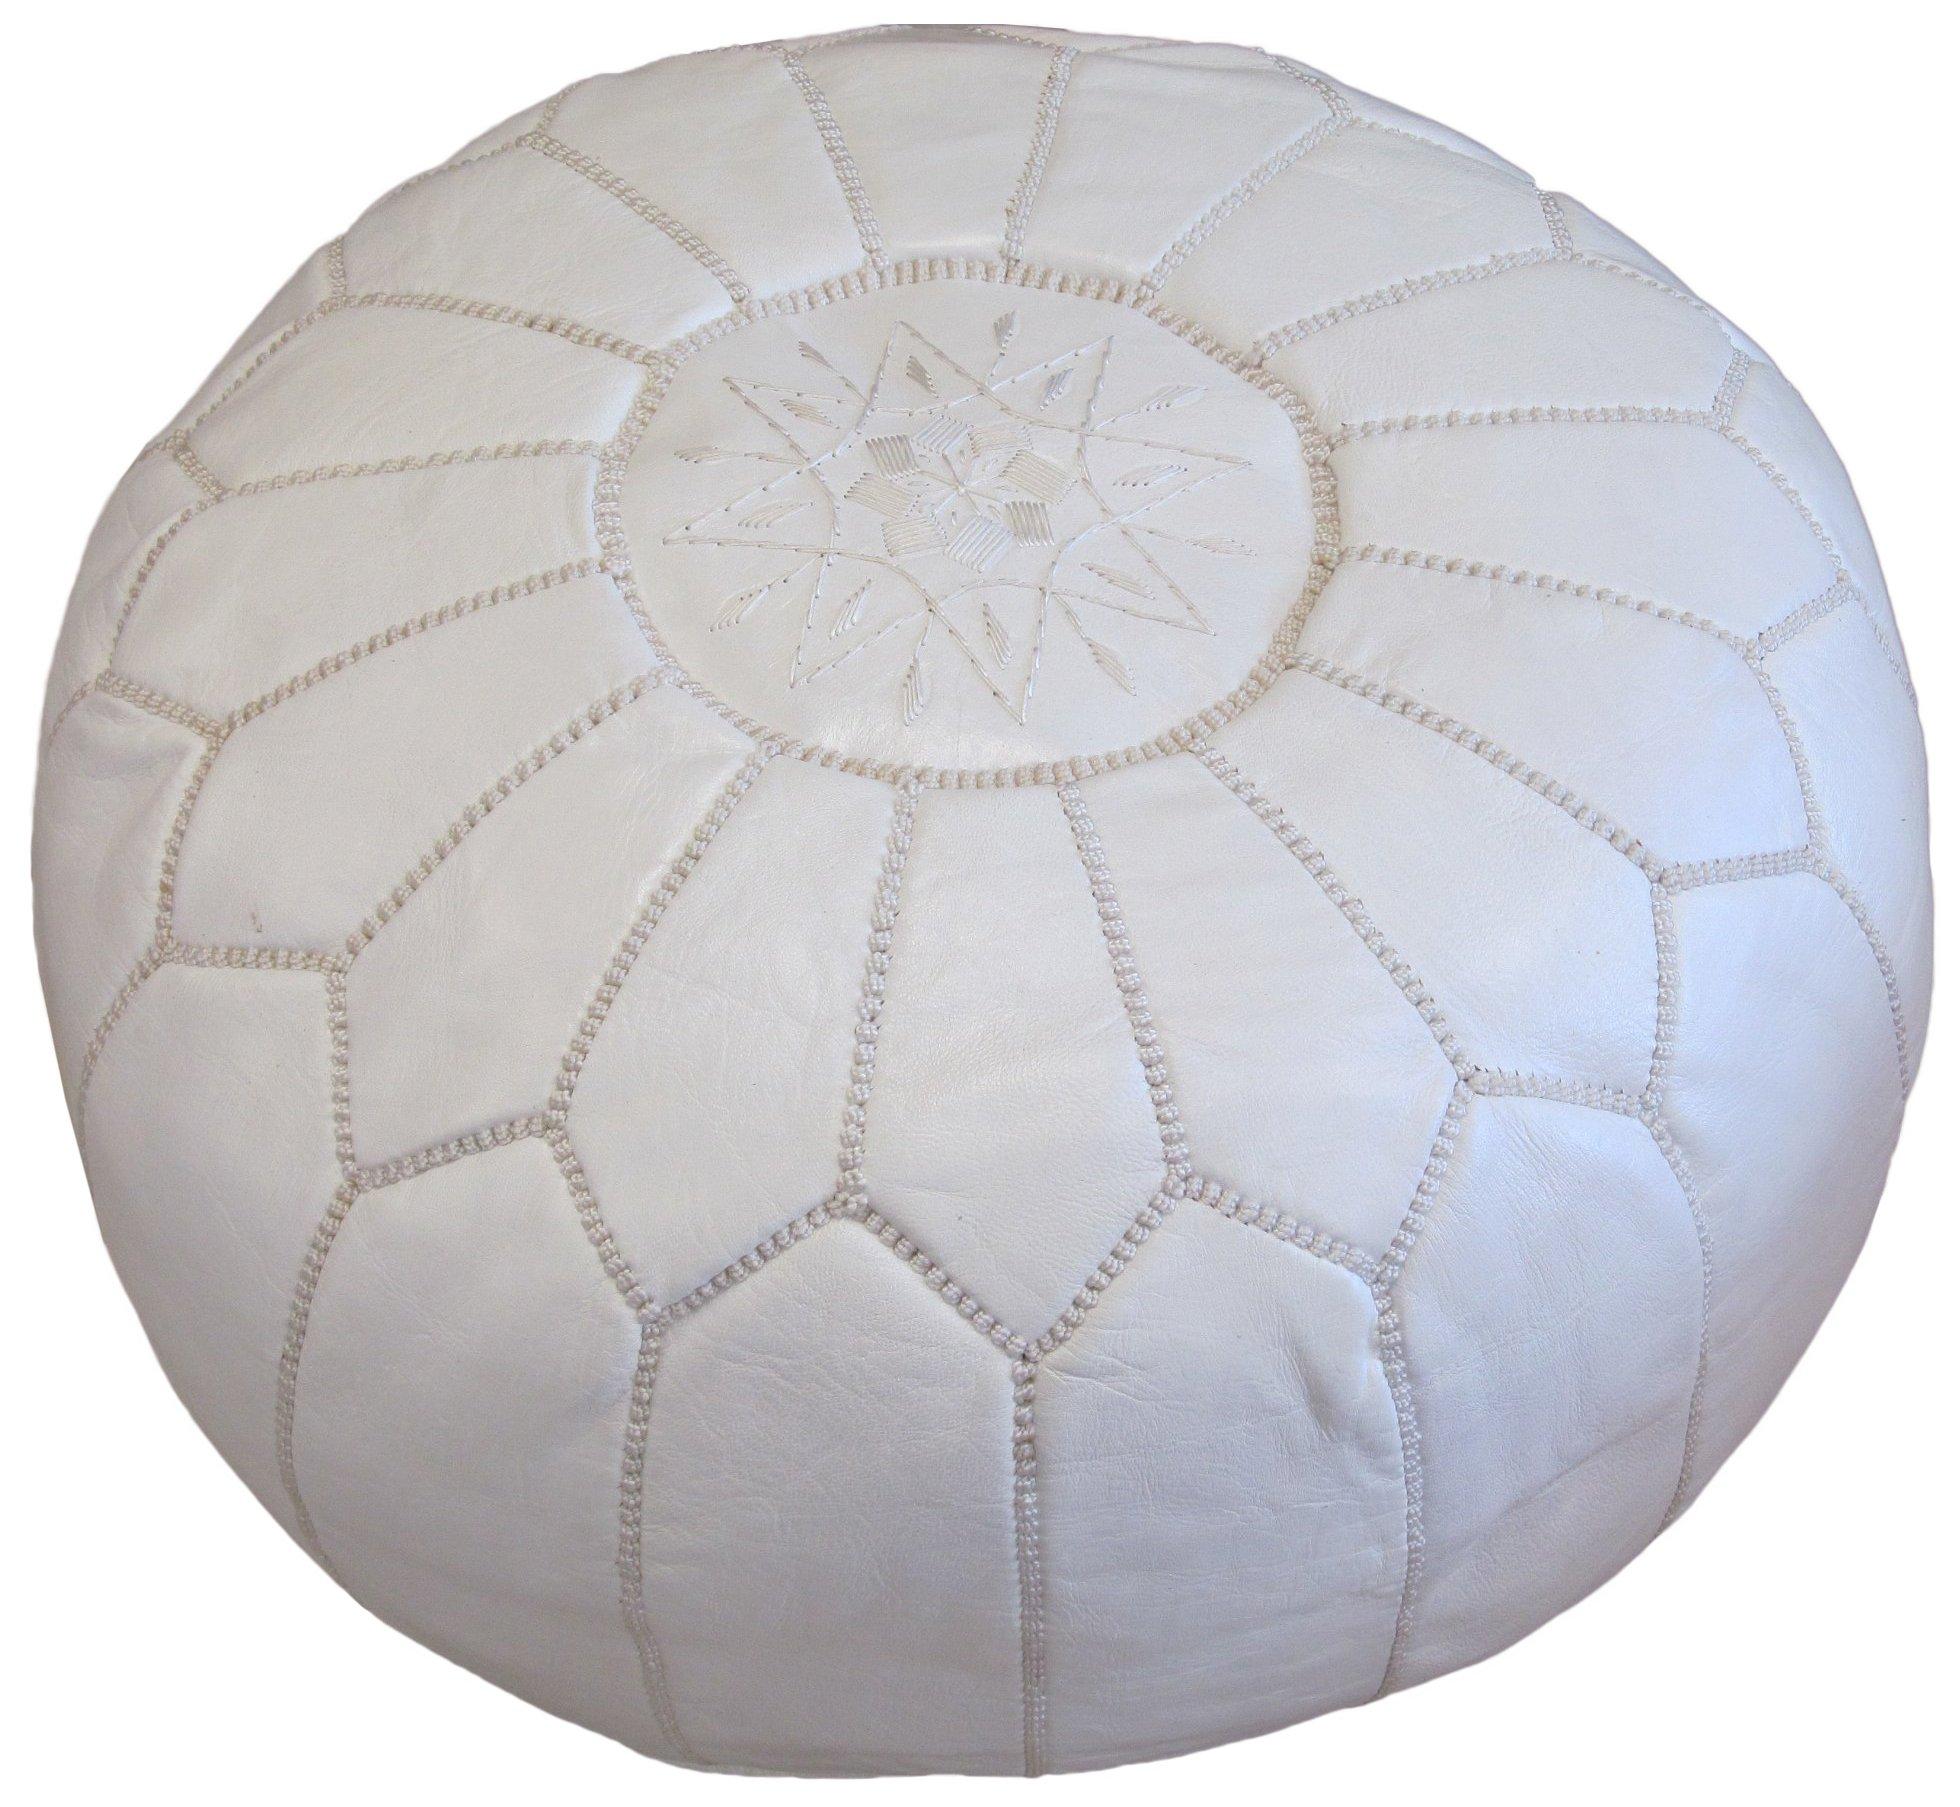 Stuffed Moroccan Pouf, Pouffe, Ottoman, Poof, Color : White